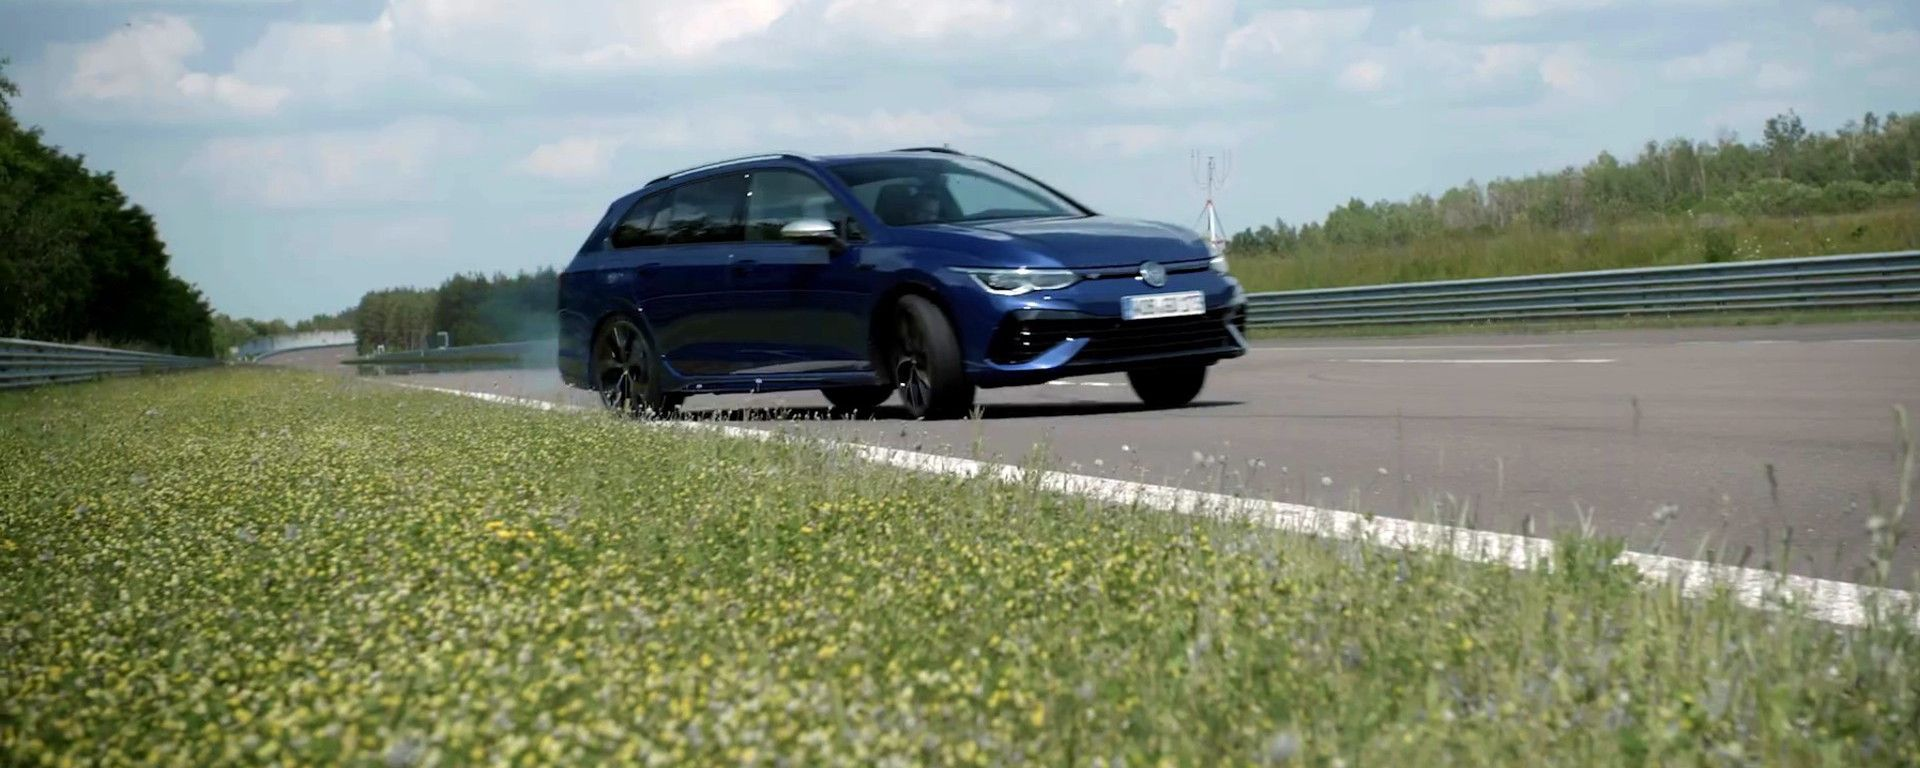 La nuova Volkswagen Golf R Variant 2022 con Drift Mode